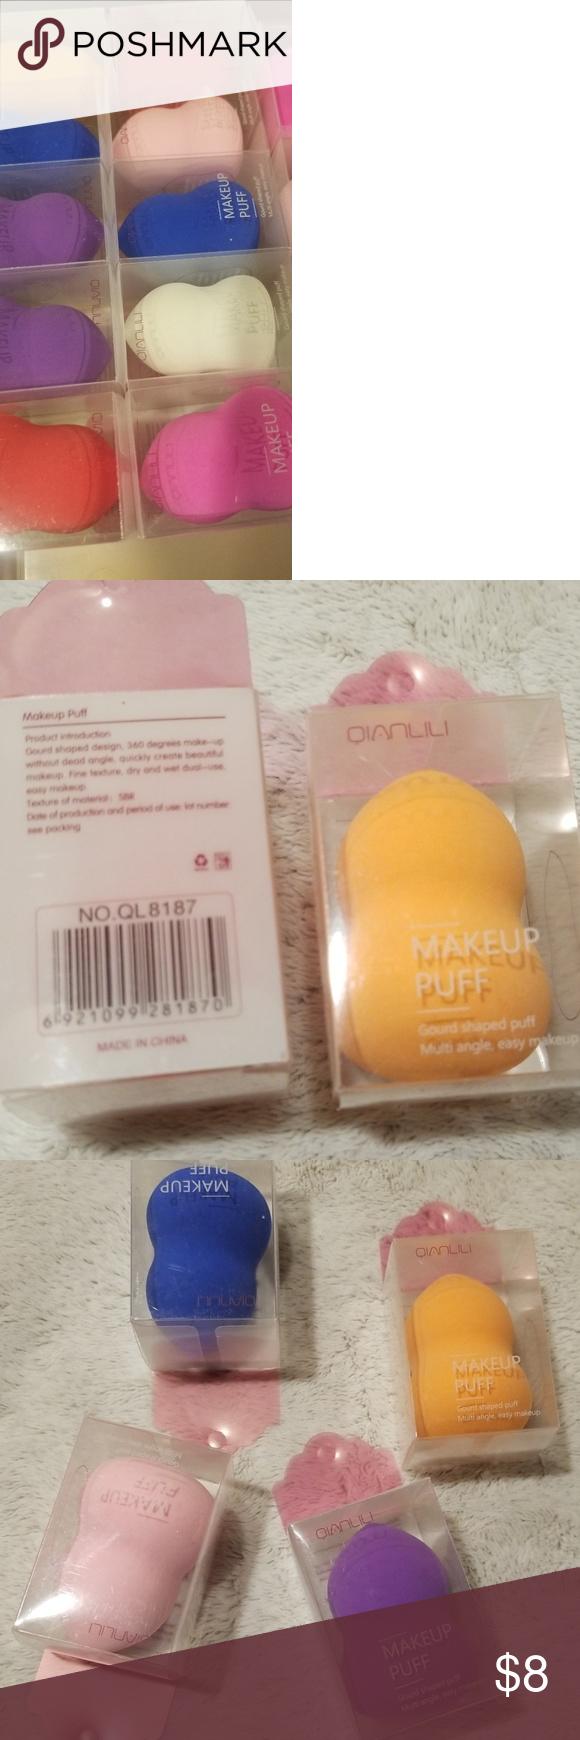 Makeup Sponges Boutique Makeup sponge, Makeup tools